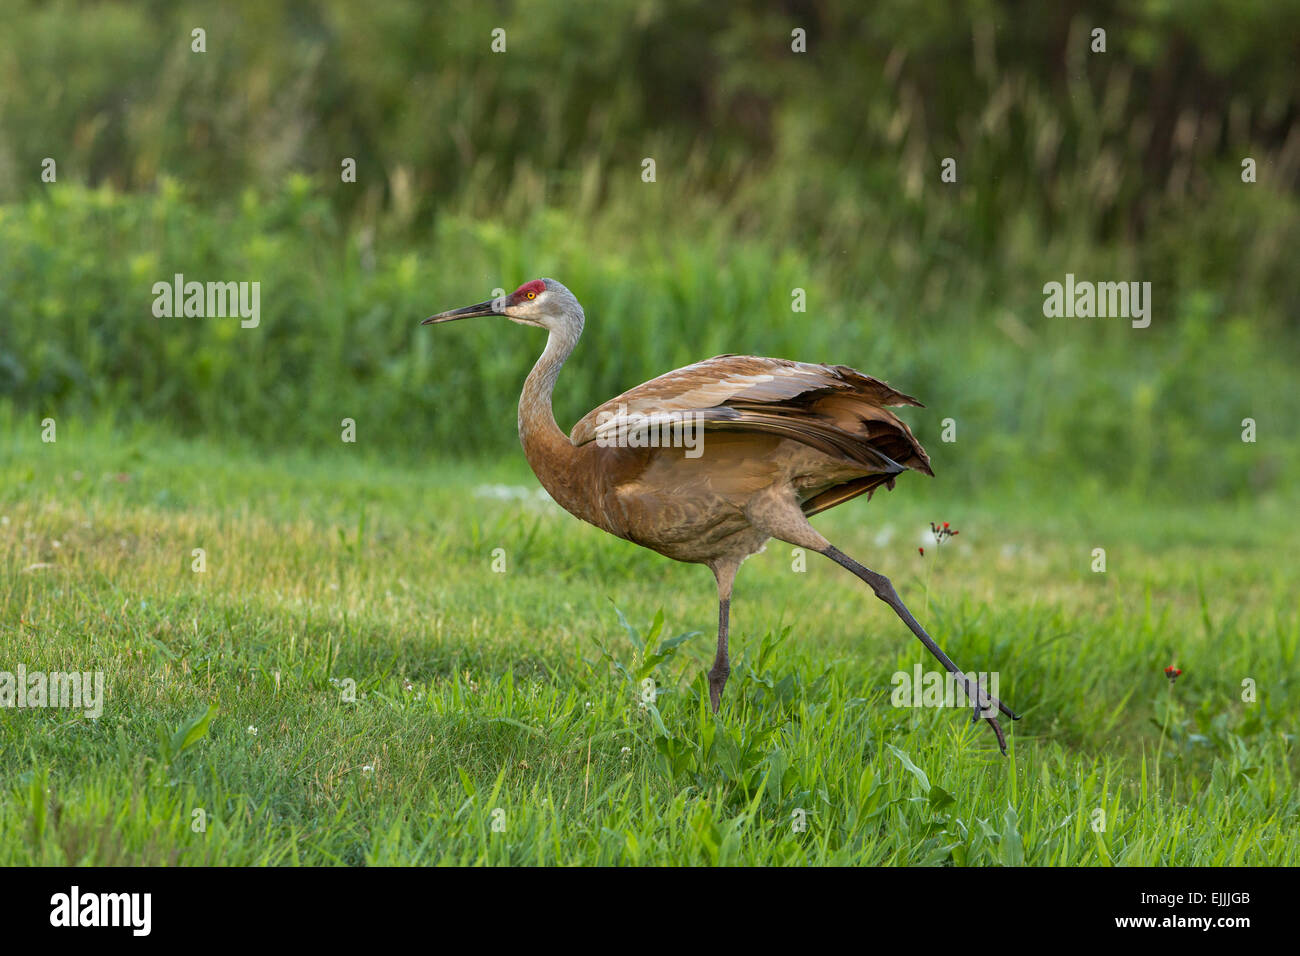 Sandhill crane preparing to fly - Stock Image